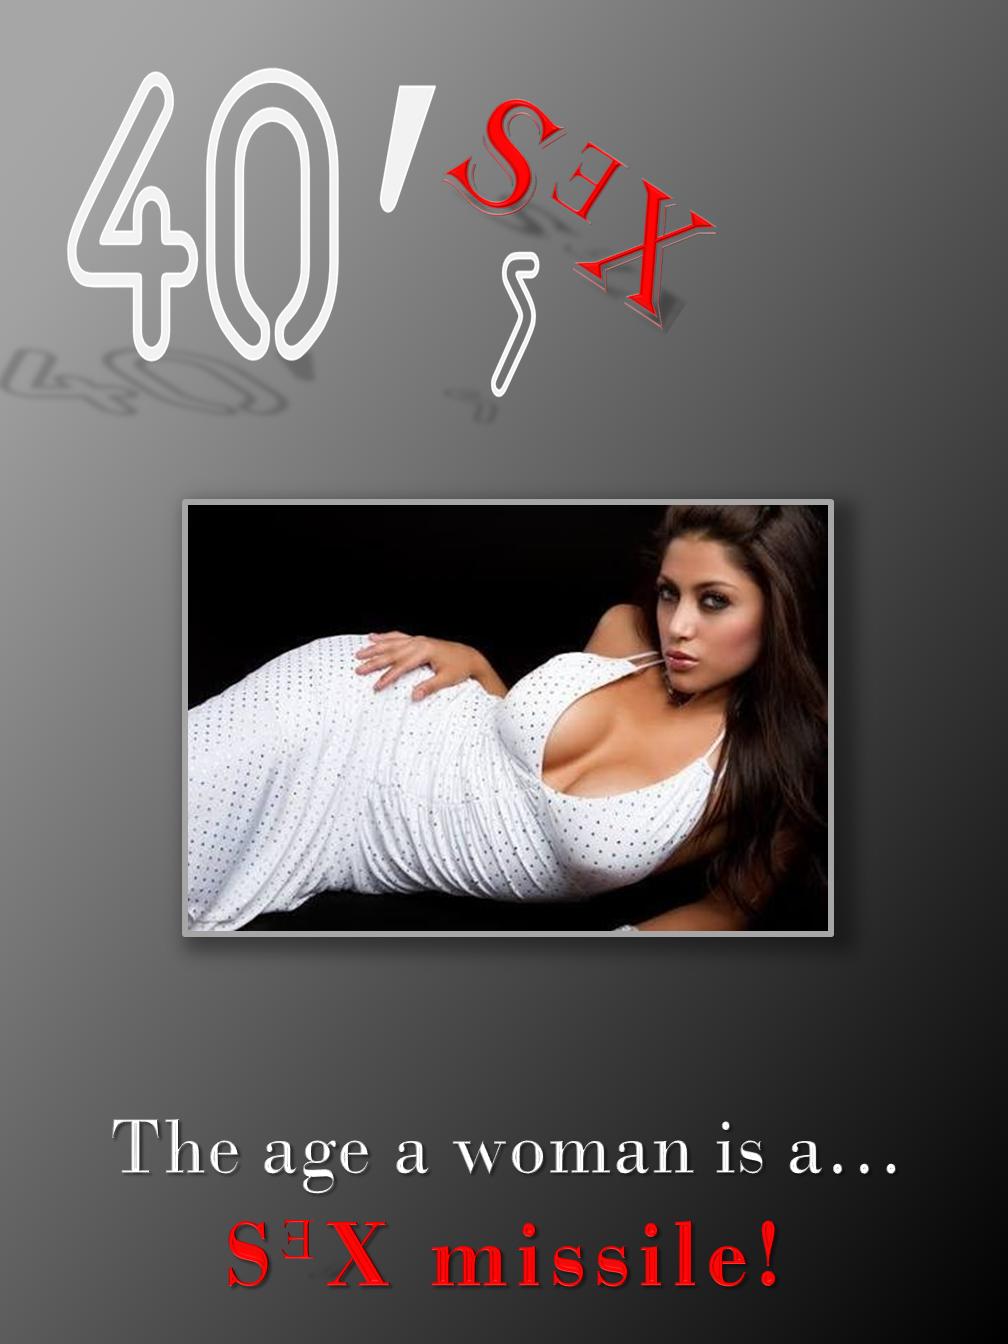 40's...